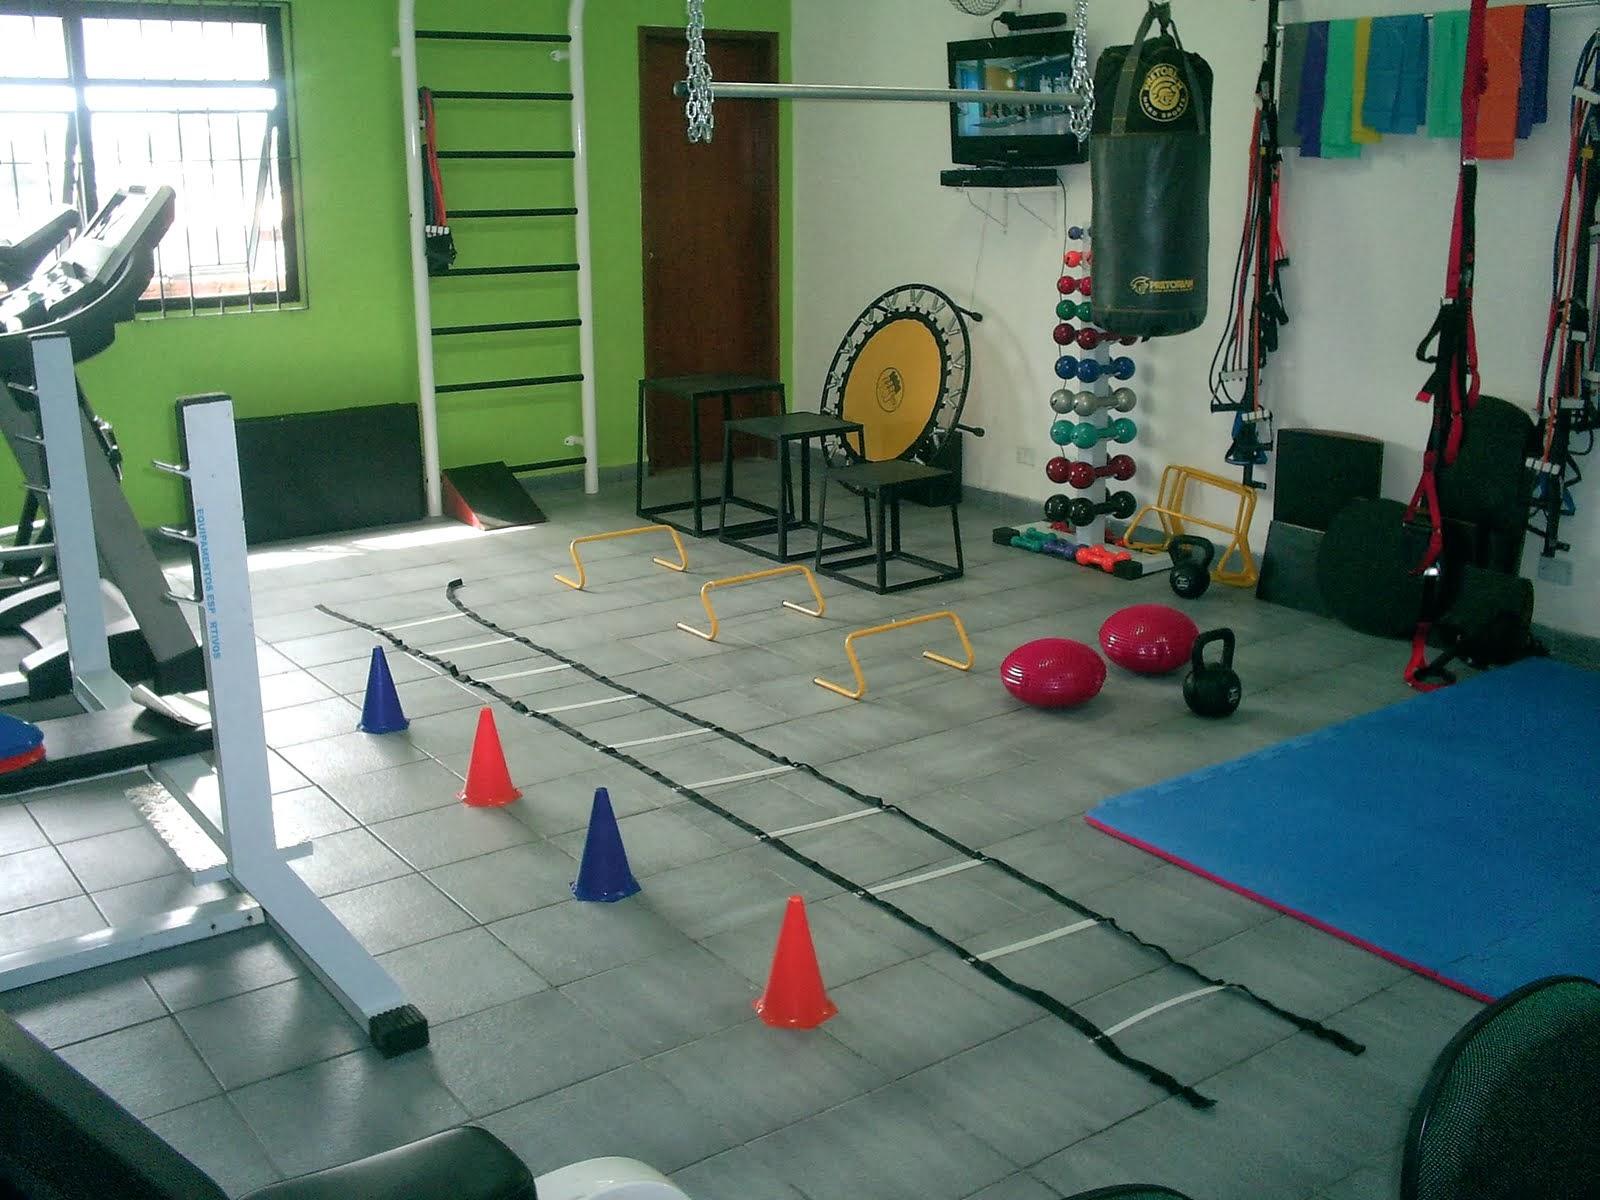 treinamento-funcional-triathlonemfoco-005.jpg